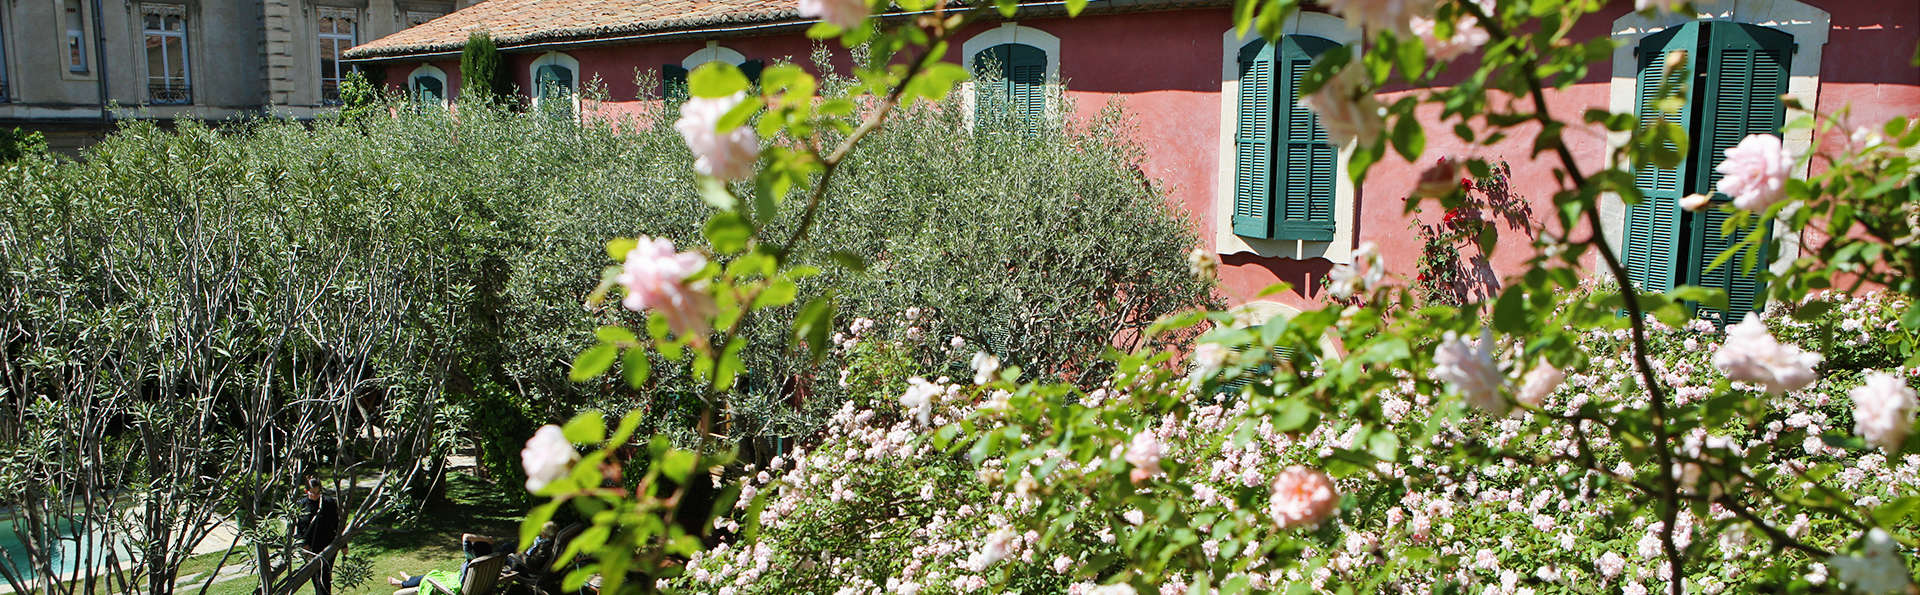 Hôtel Jardins Secrets - EDIT_Fachada.jpg